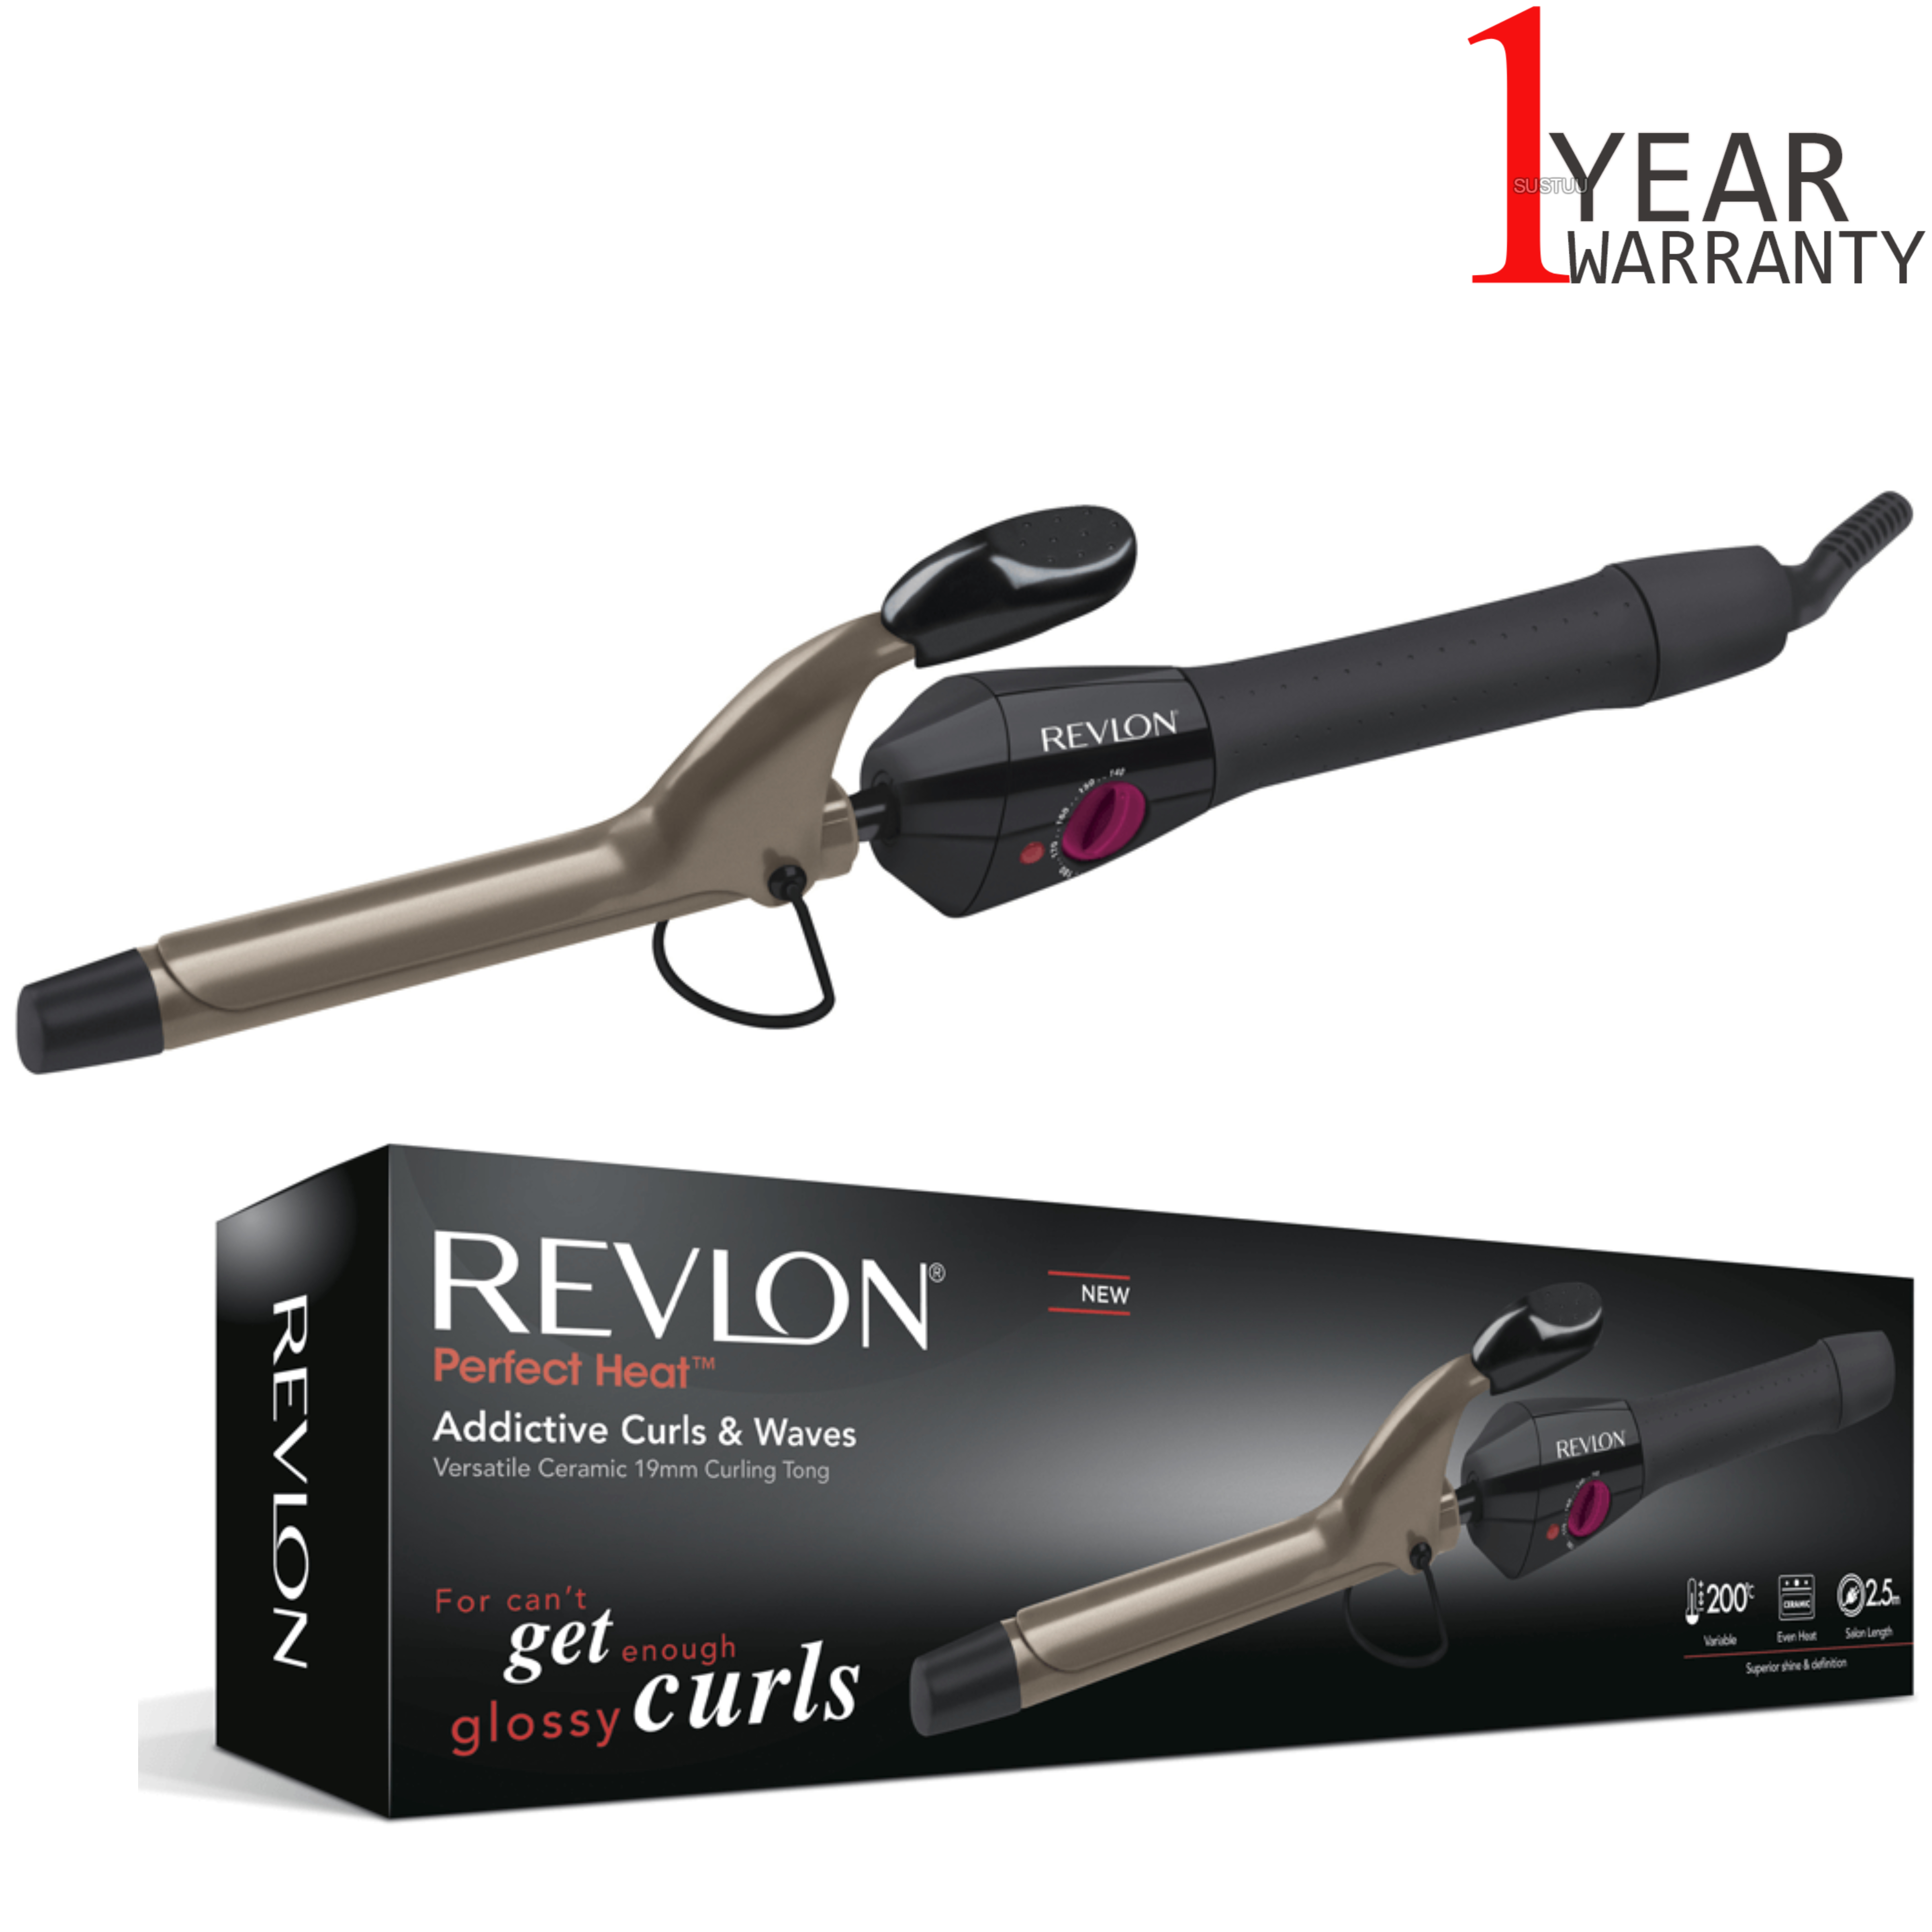 Revlon Perfect Heat Addictive Curls & Waves | 19mm Ceramic Curling Tong | 200°C | IR1409